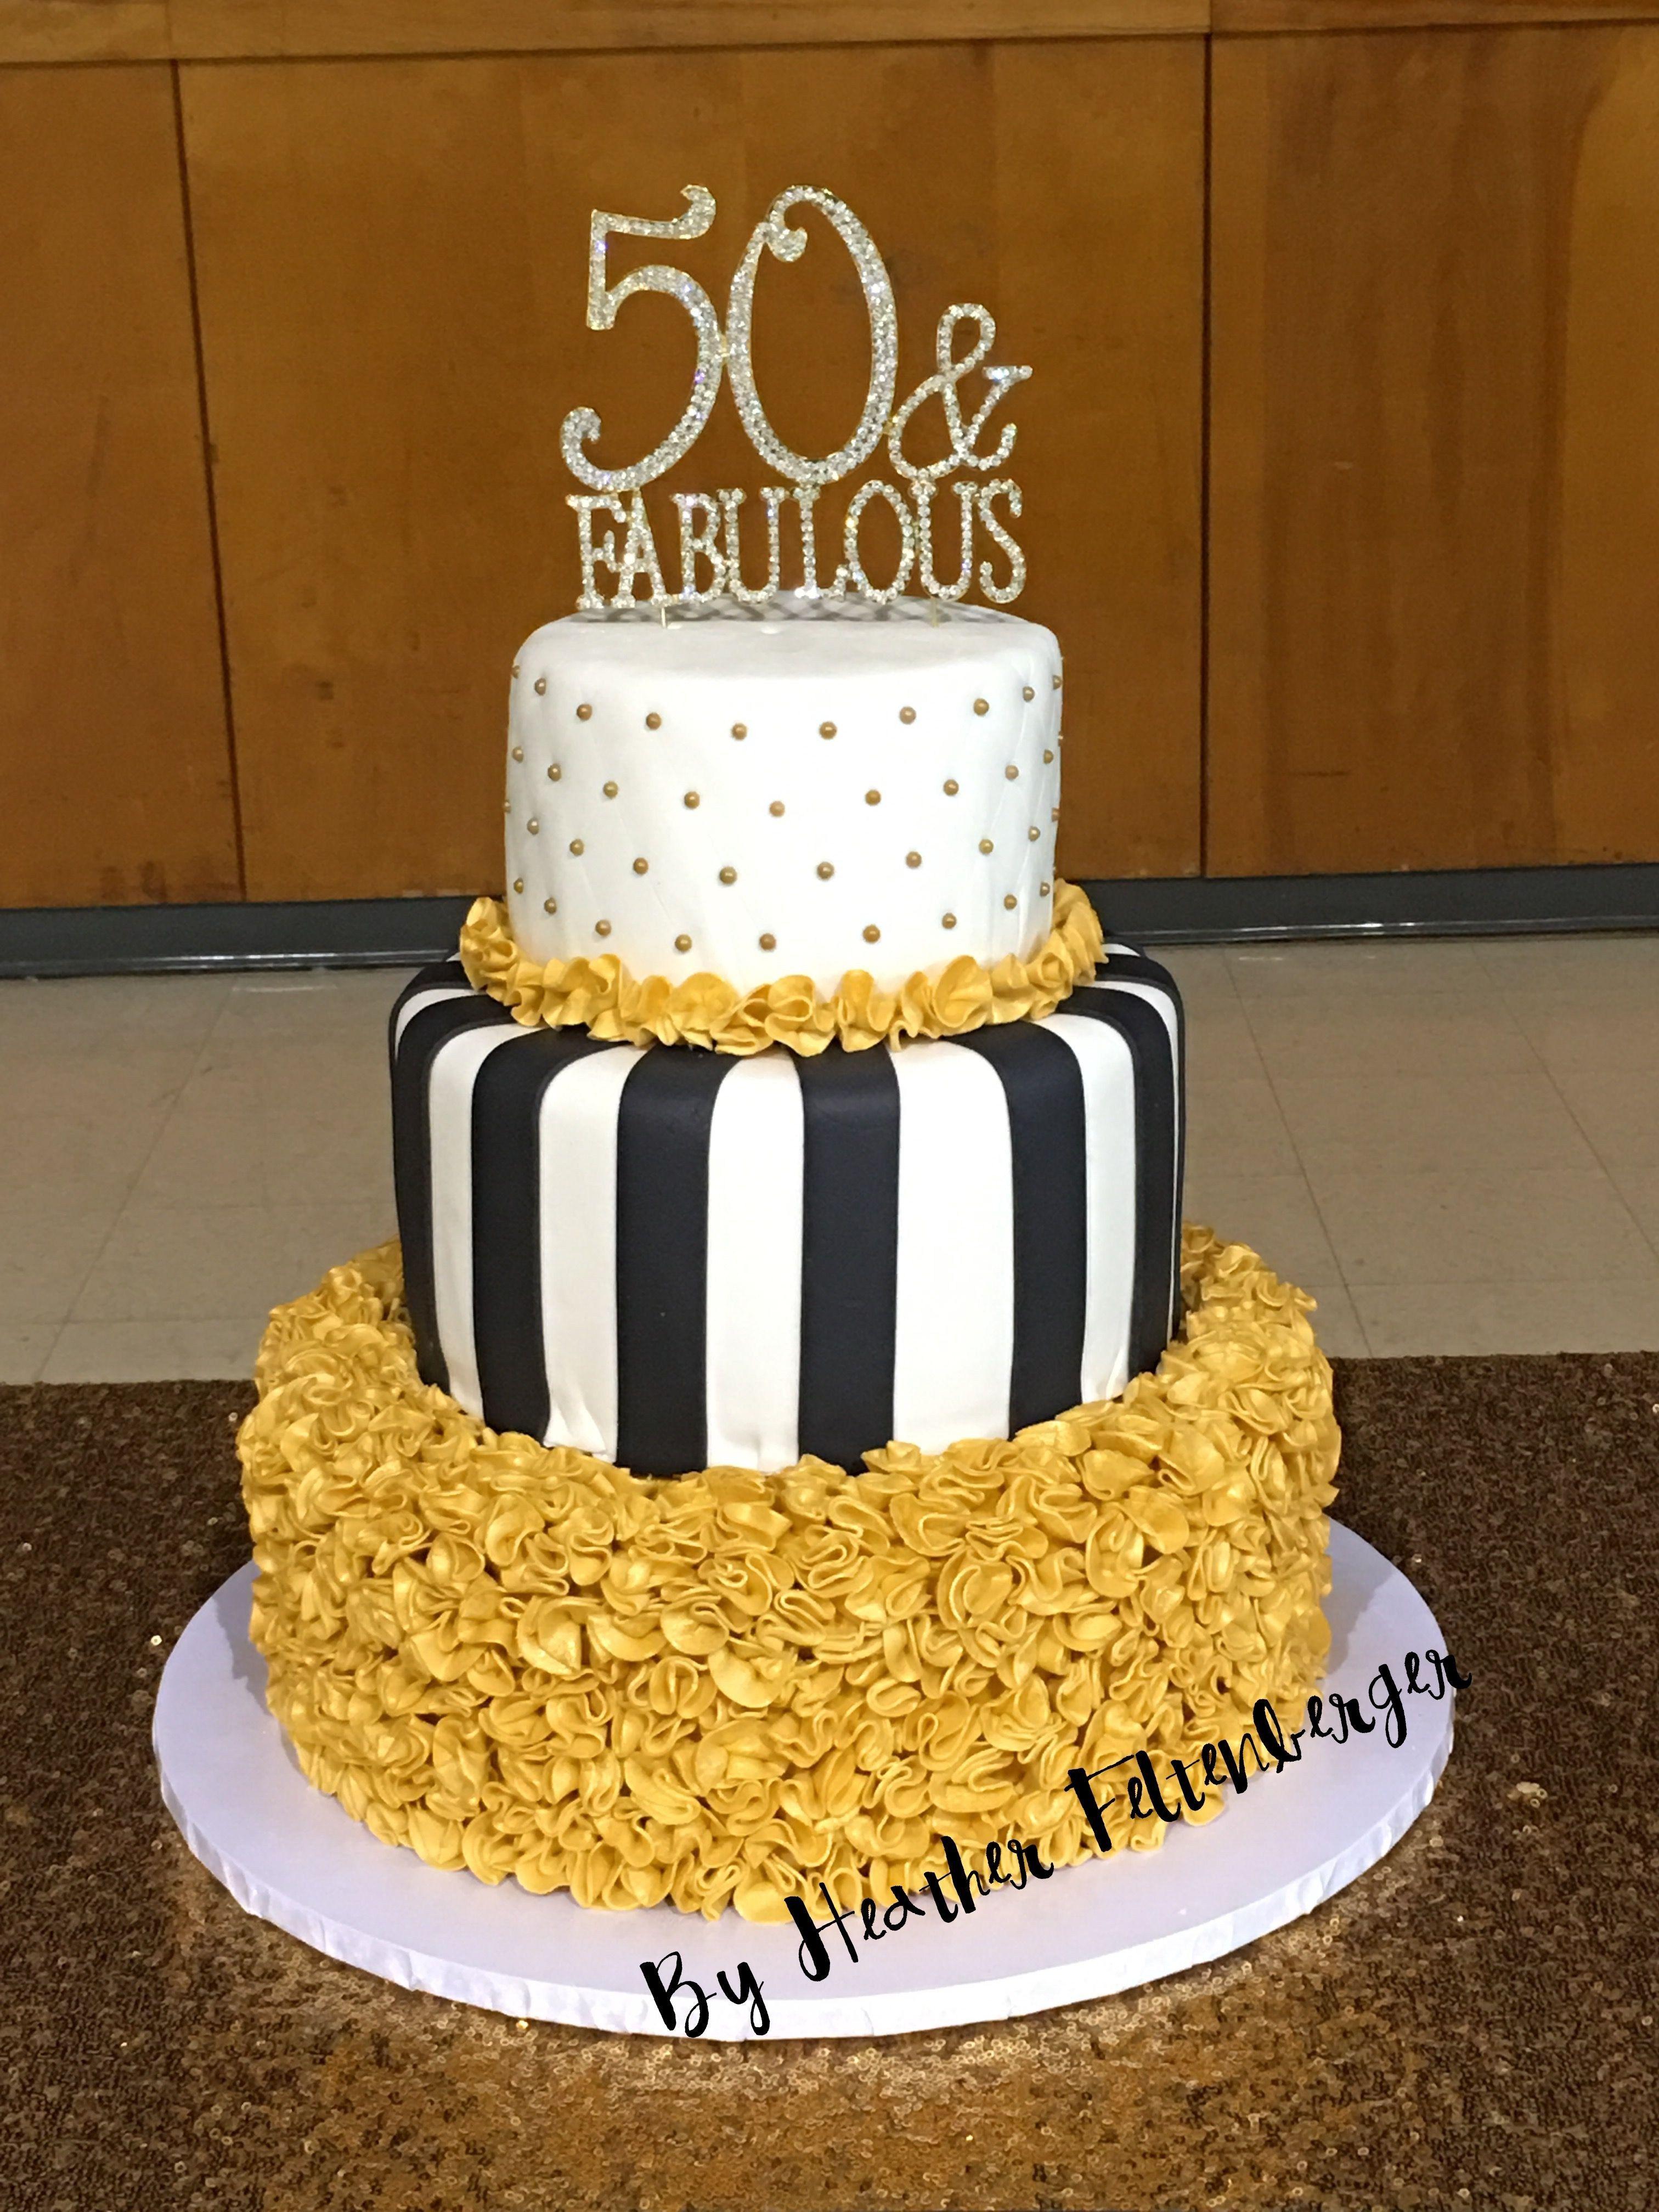 Wondrous 23 Wonderful Image Of 50 Birthday Cake 50 Birthday Cake 3 Tier Personalised Birthday Cards Cominlily Jamesorg